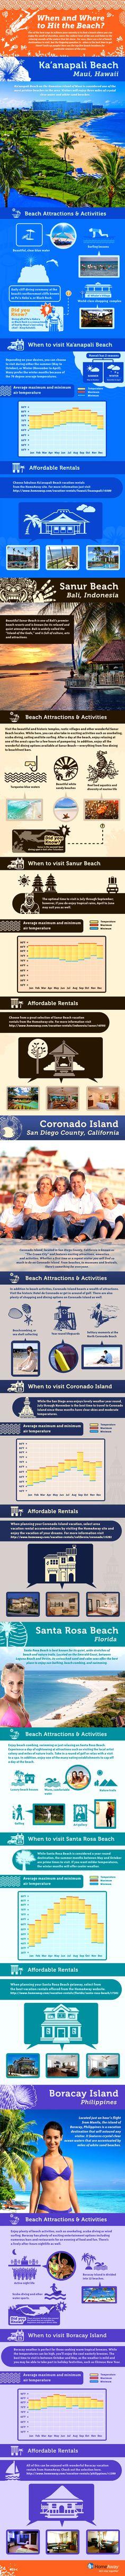 When/where to hit the beach for a great vacation!  Maui, Hawaii; Bali, Indonesia; Coronado Island, Cali;Santa Rosa Beach, FL; Boracay Island, Philippines.